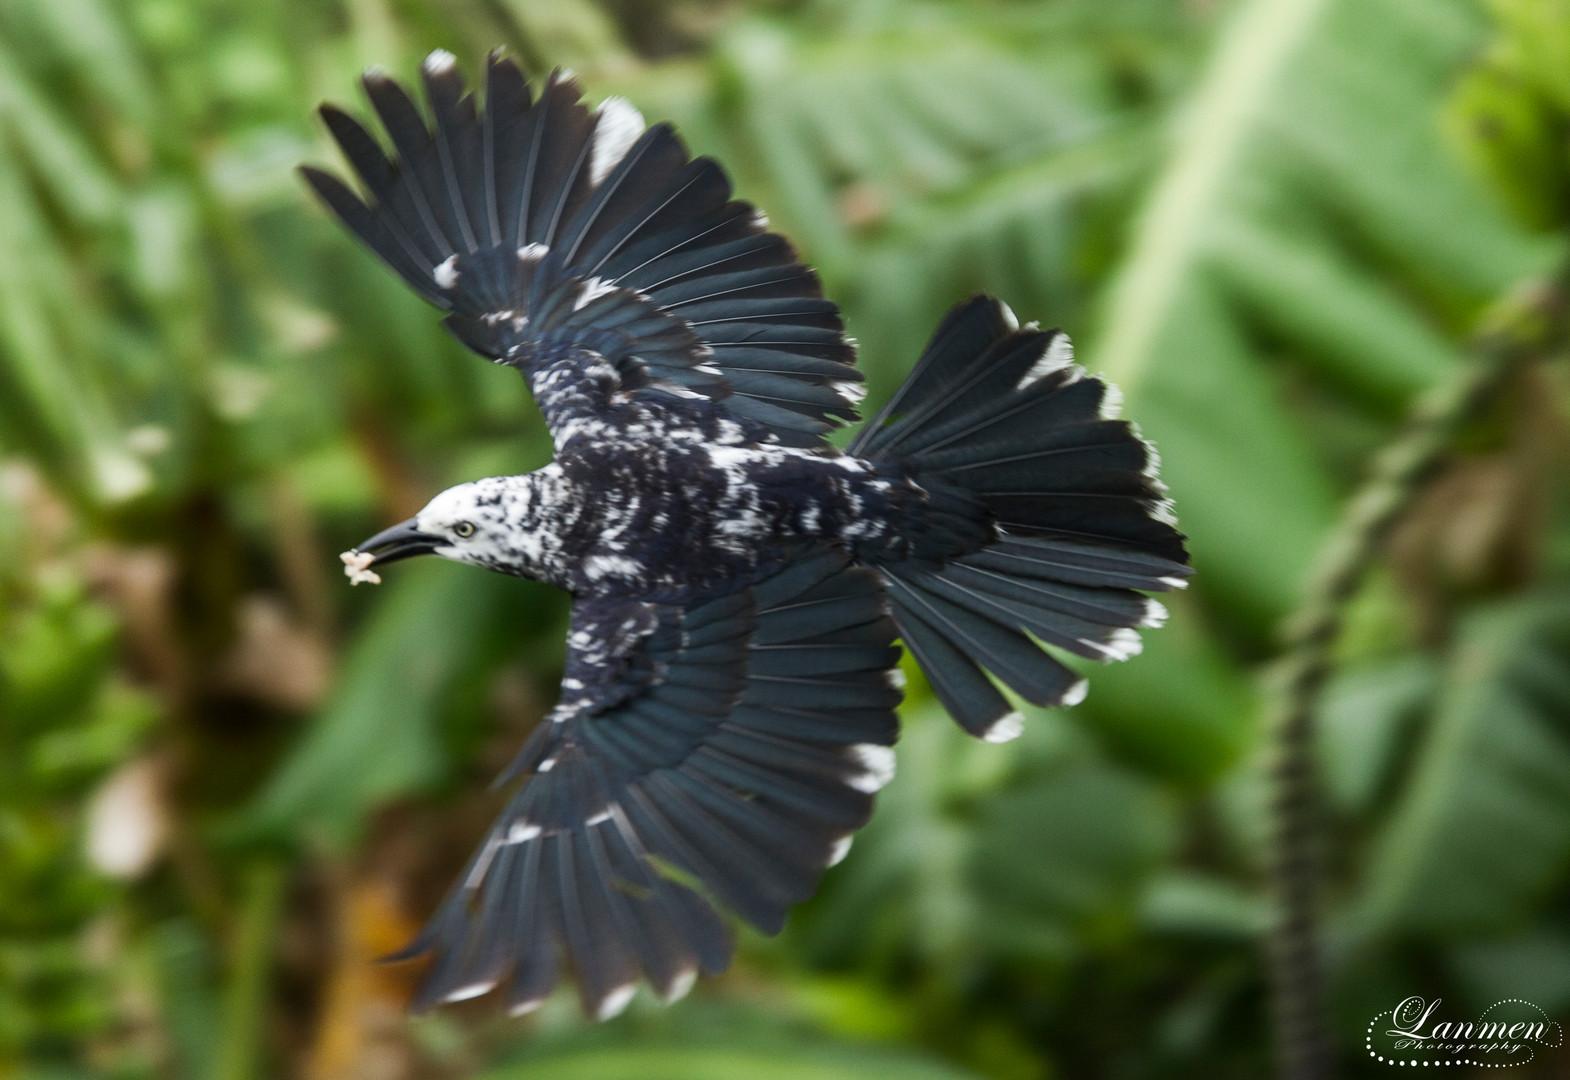 St Lucia Photography Wildlife Bird Carib